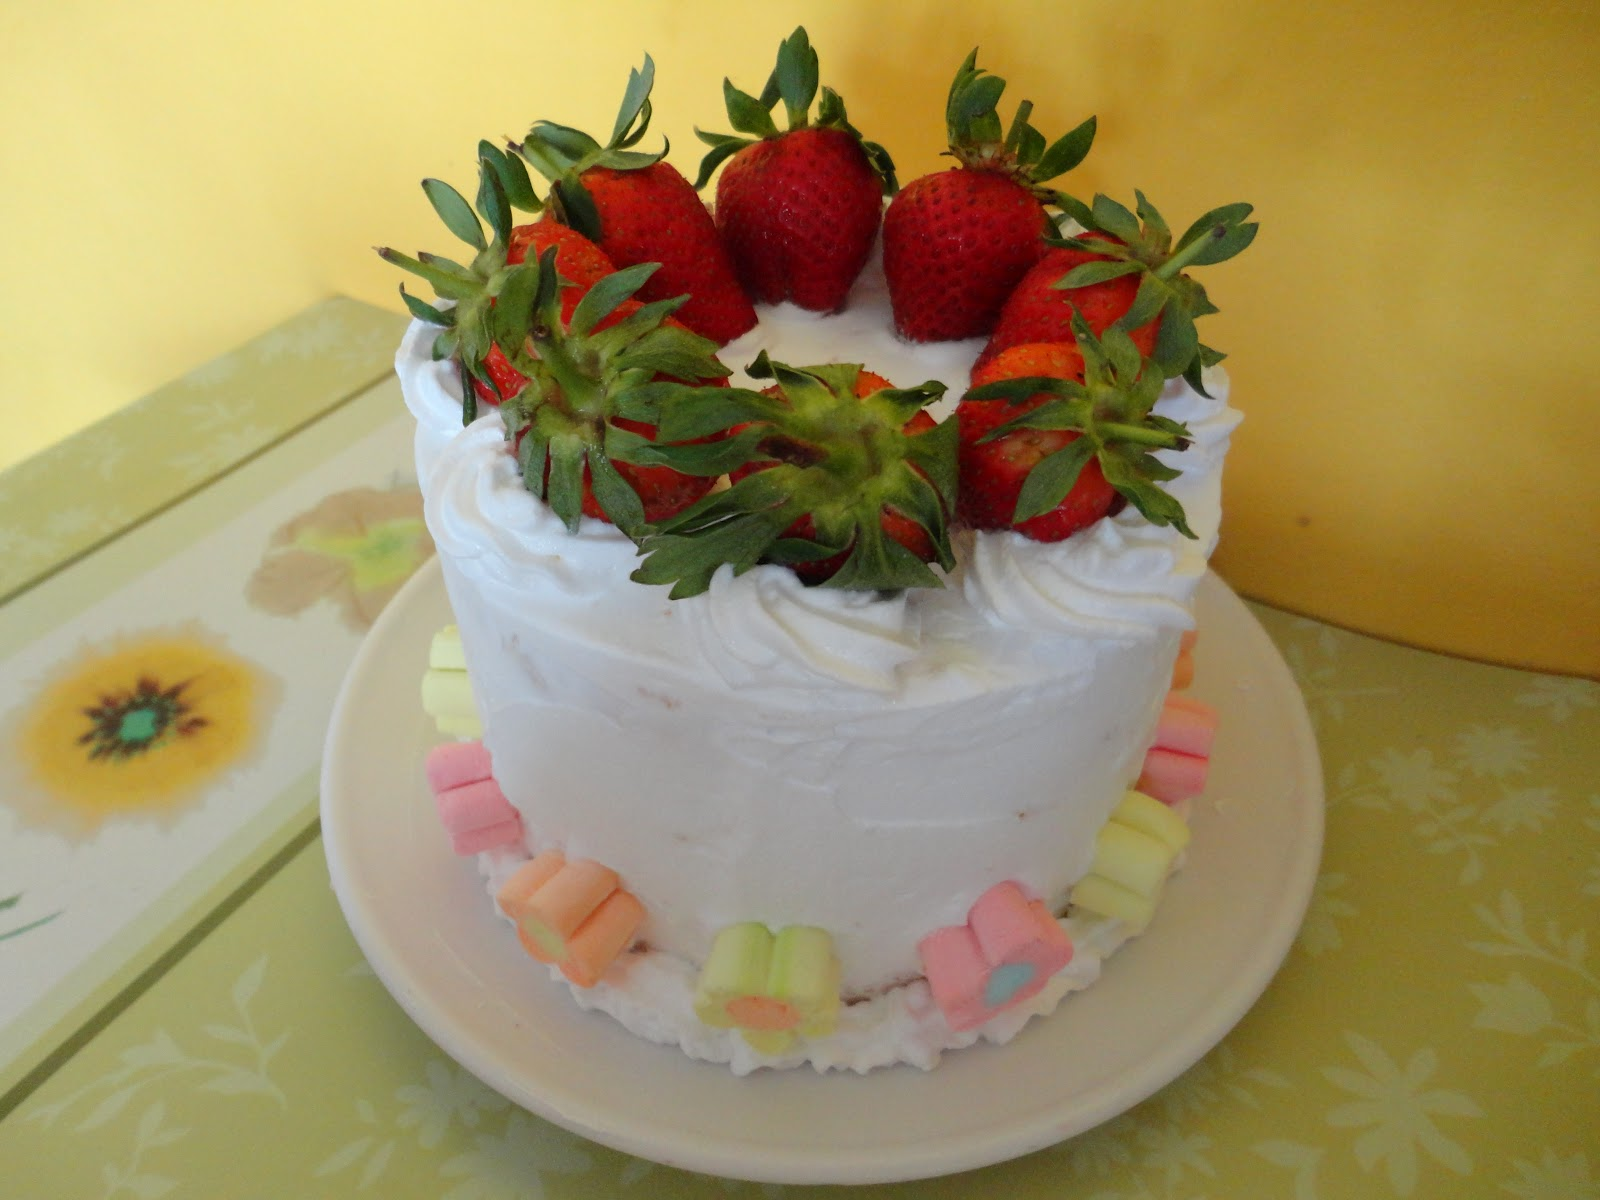 Homemade Birthday Cakes For Boyfriend March is my lovely boyfriend